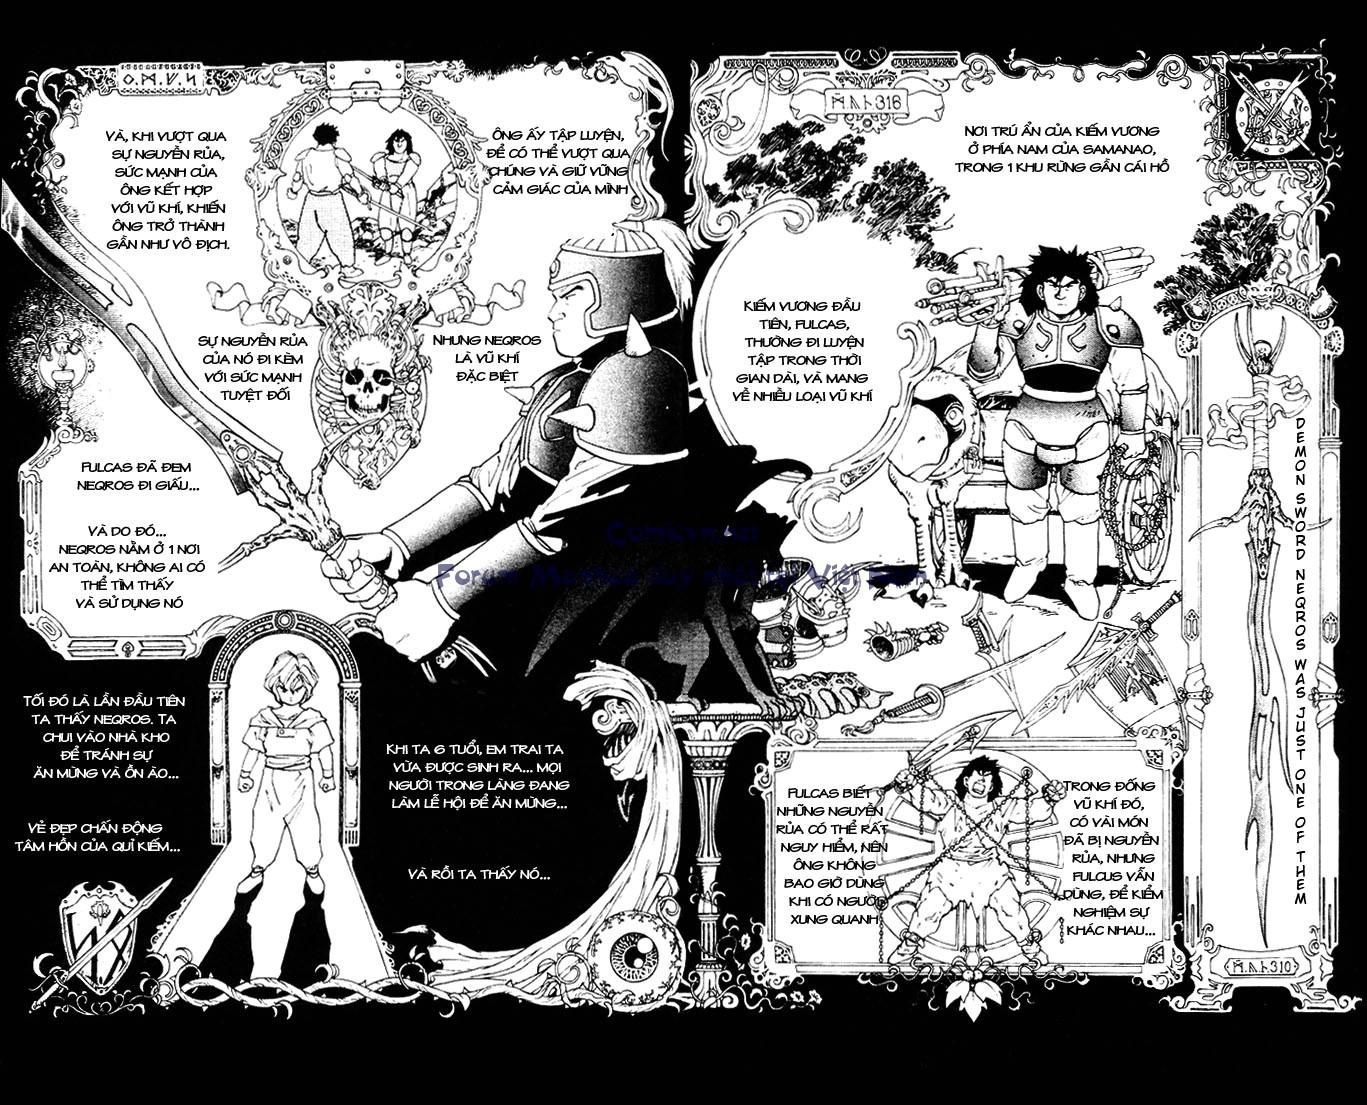 Dấu ấn rồng thiêng 2 – Emblem of Roto chap 10 Trang 6